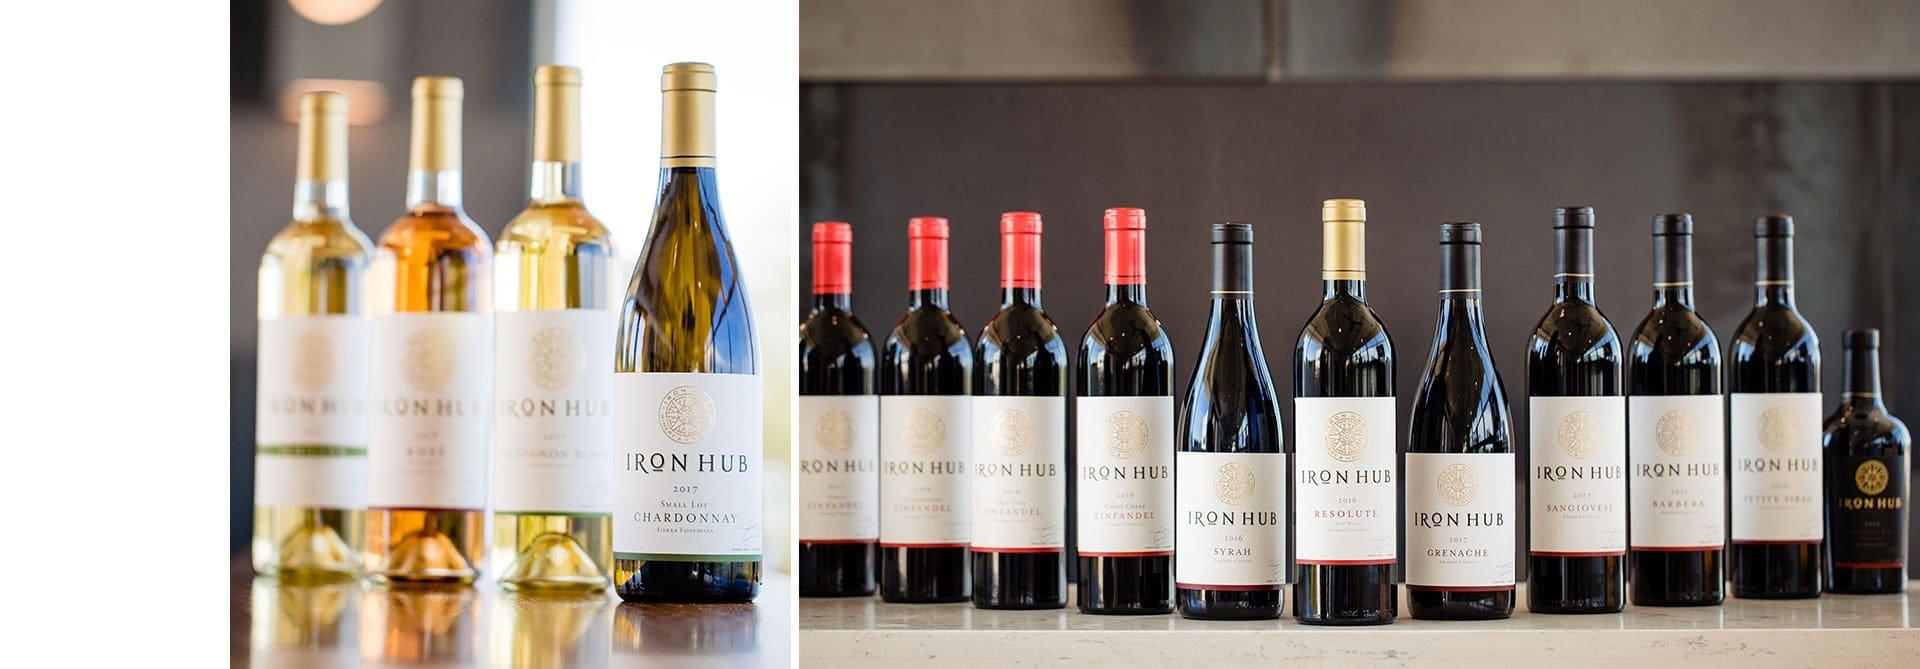 Iron Hub Wines